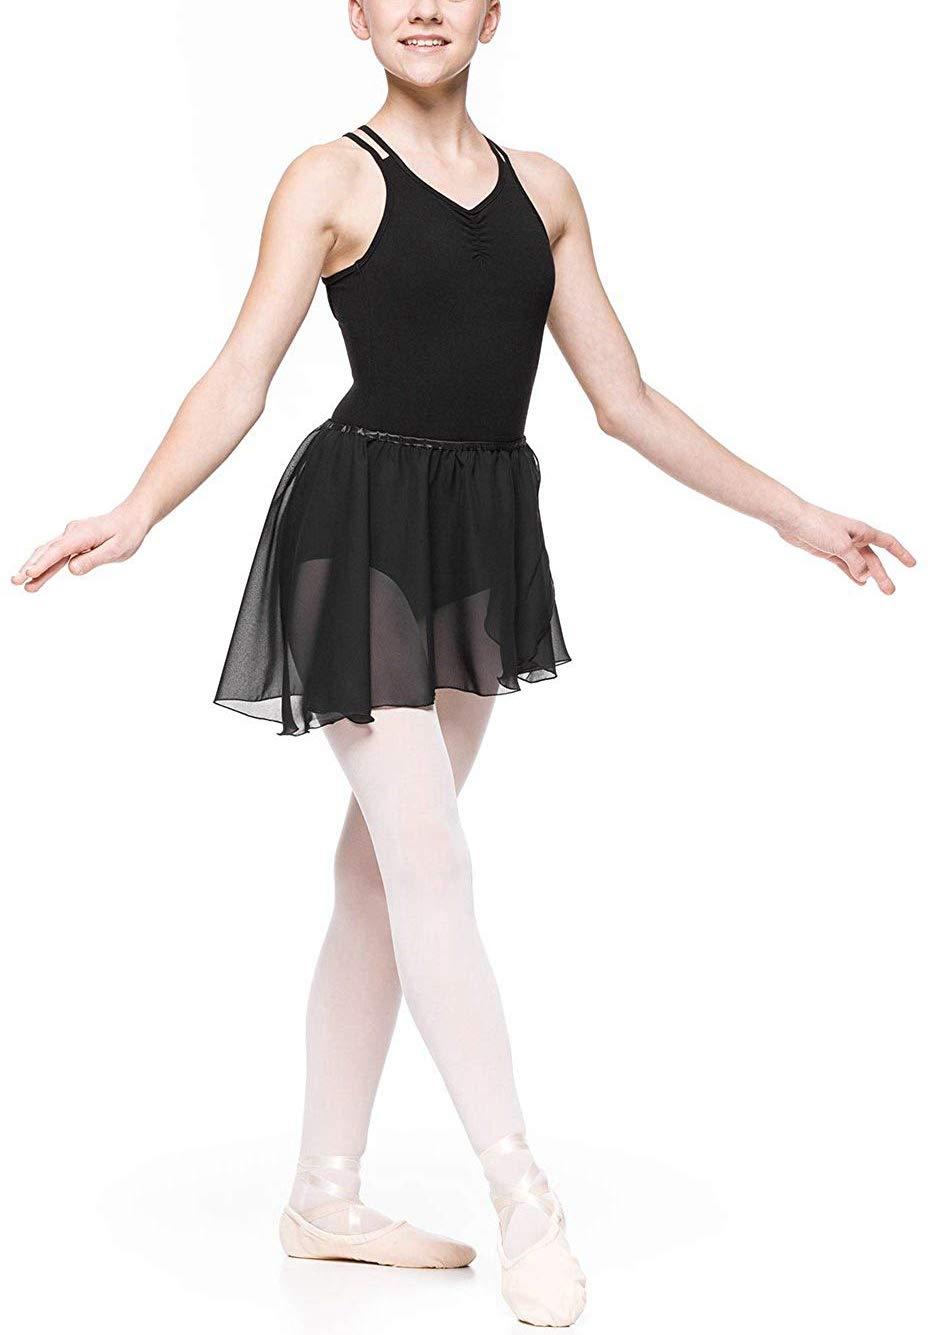 2d8f55210 iiniim Girls Team Basic Long Sleeve Sleeveless Leotard Tied Skirt ...